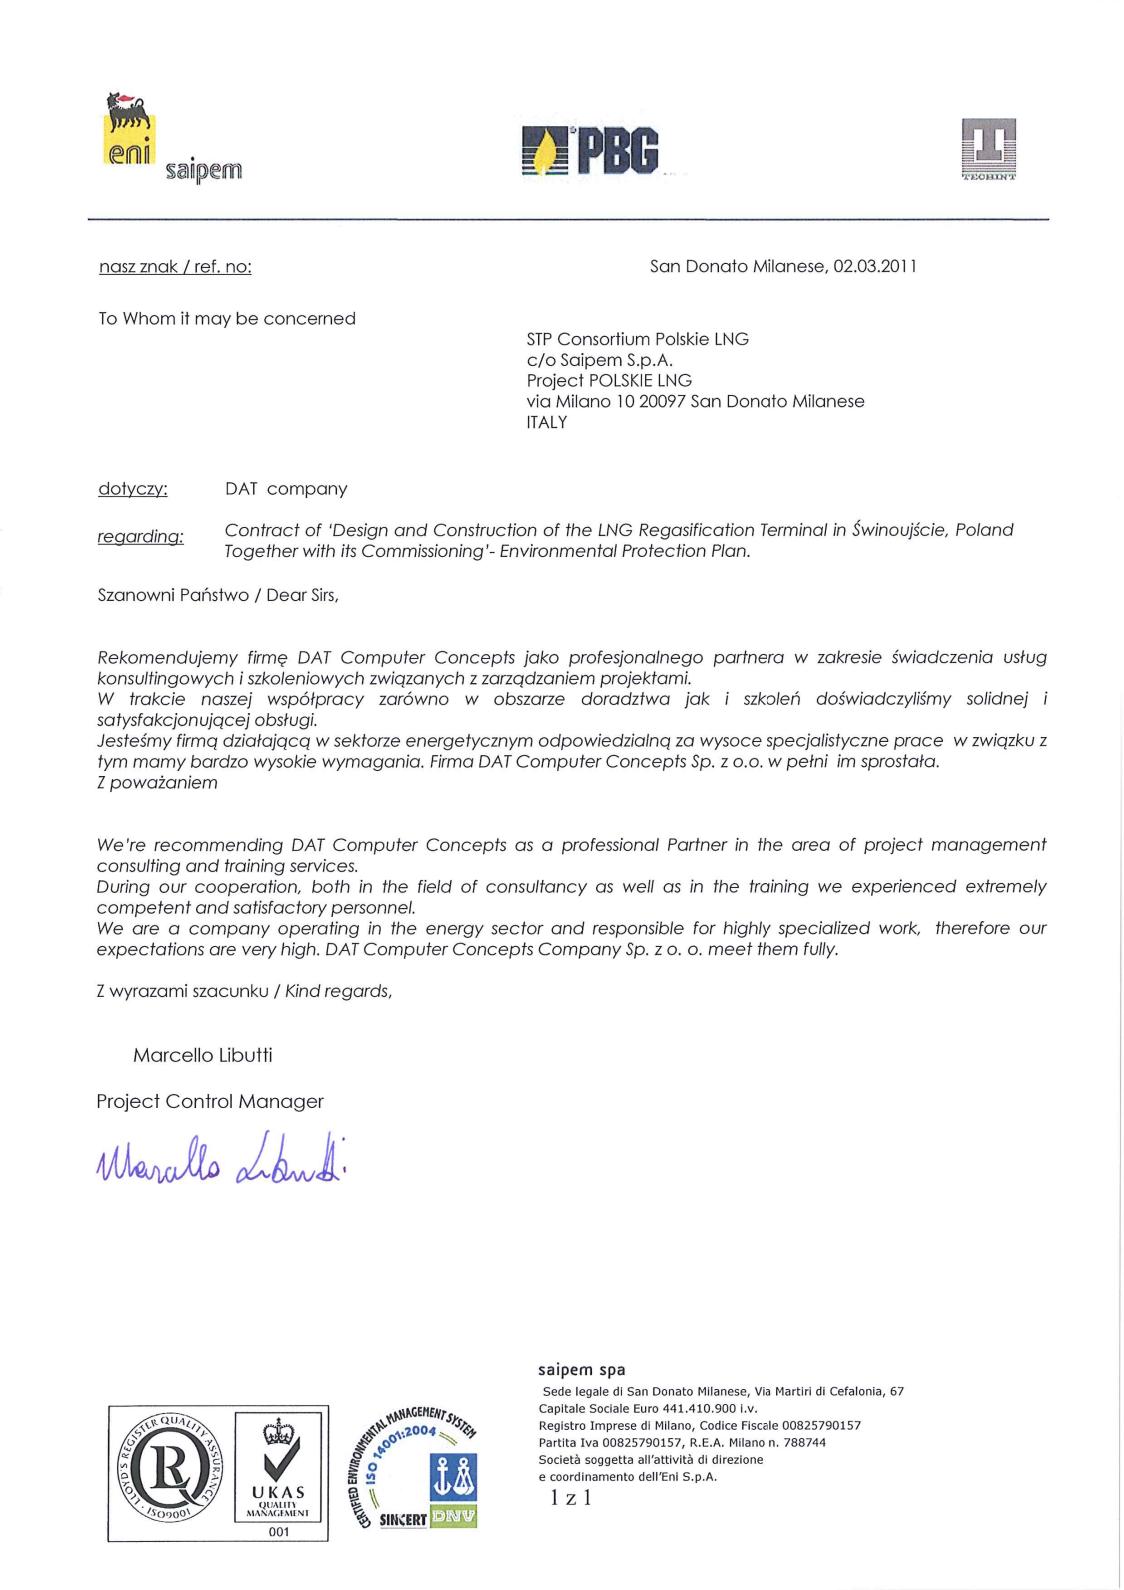 STP Consortium Polskie LNG